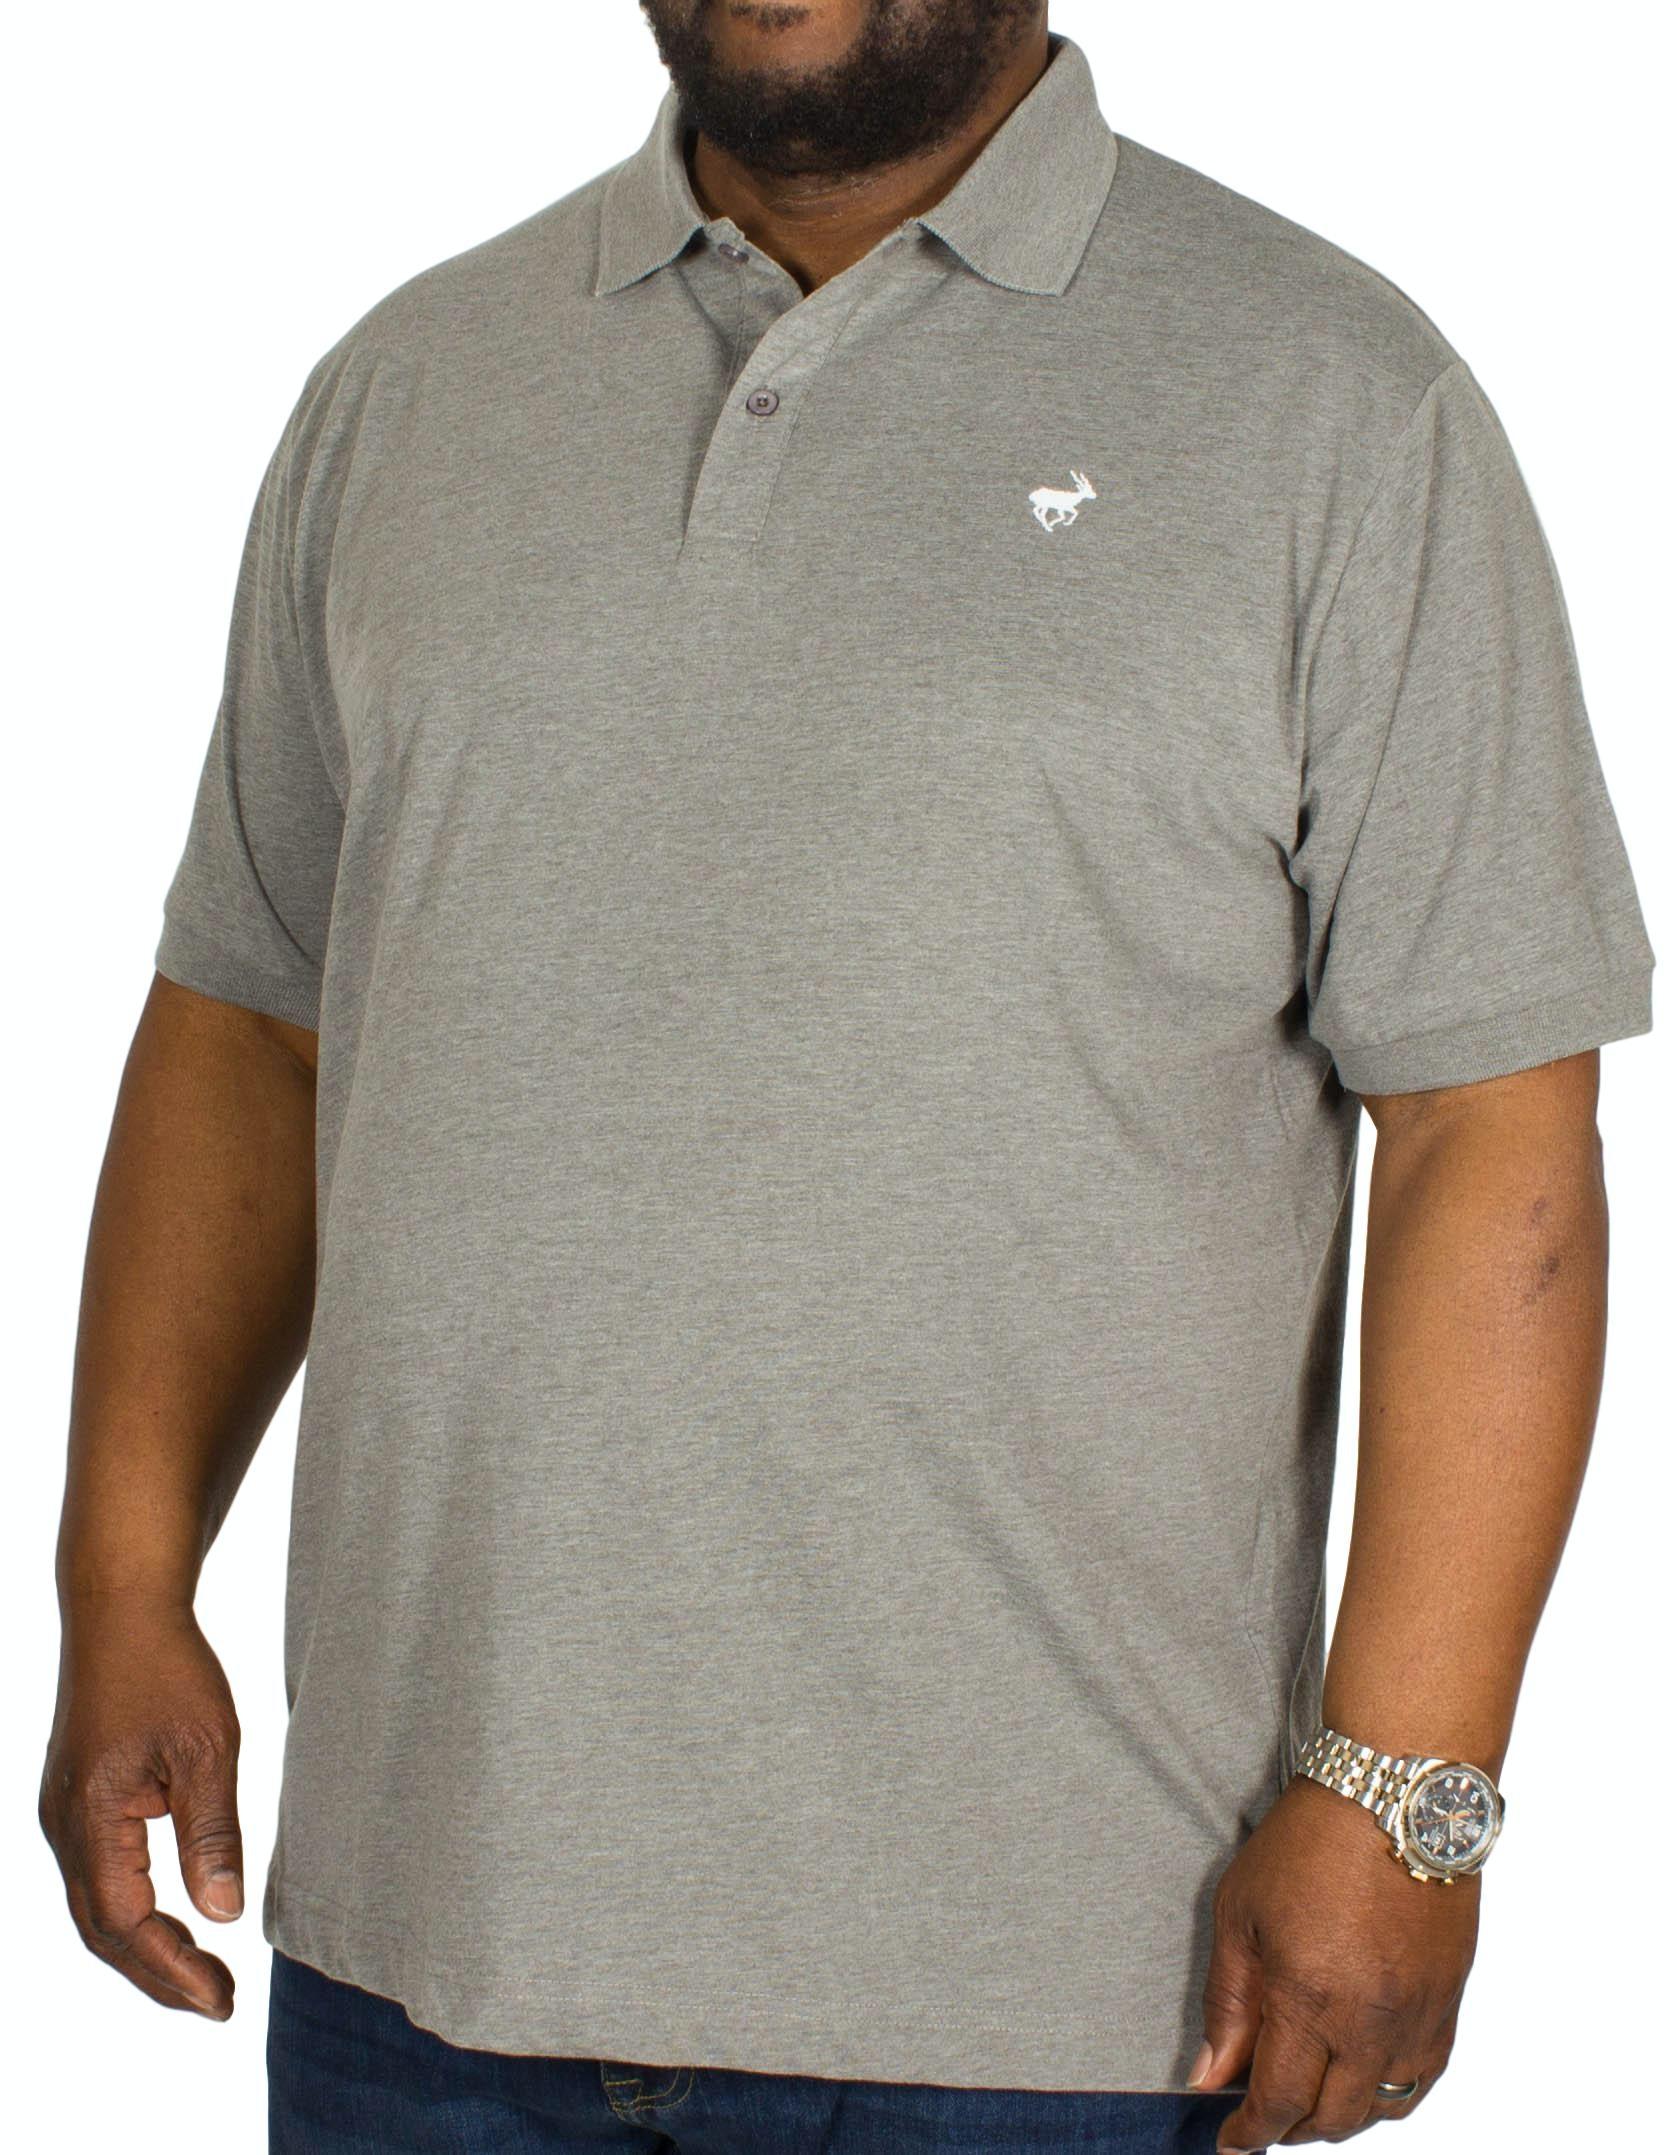 Bigdude Jersey Marl Polo Shirt Charcoal